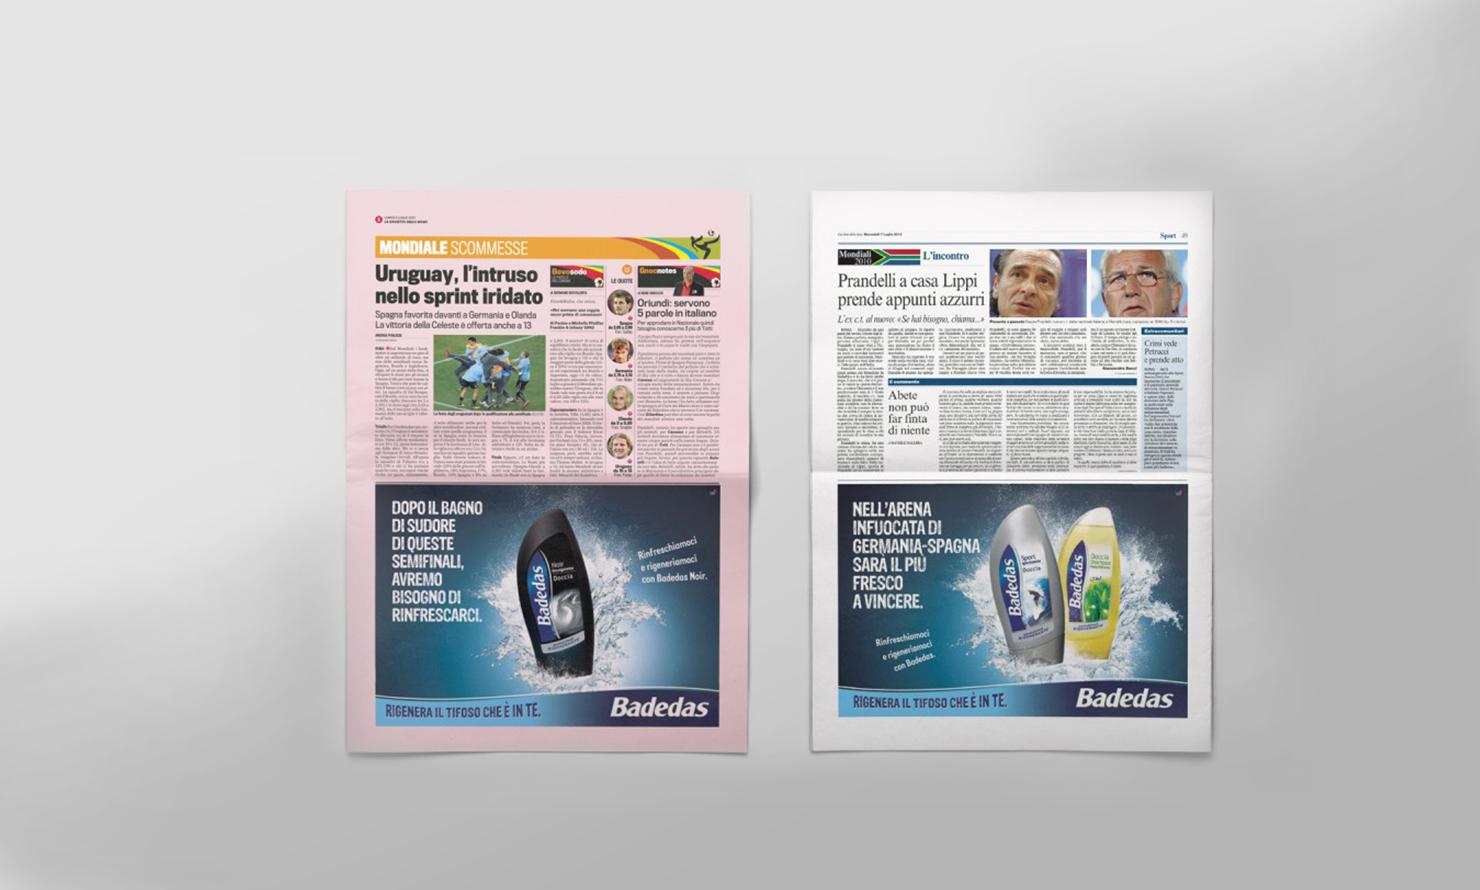 https://kubelibre.com/uploads/Slider-work-tutti-clienti/unilever-badedas-rigenera-il-tifoso-che-cè-in-te-3.jpg